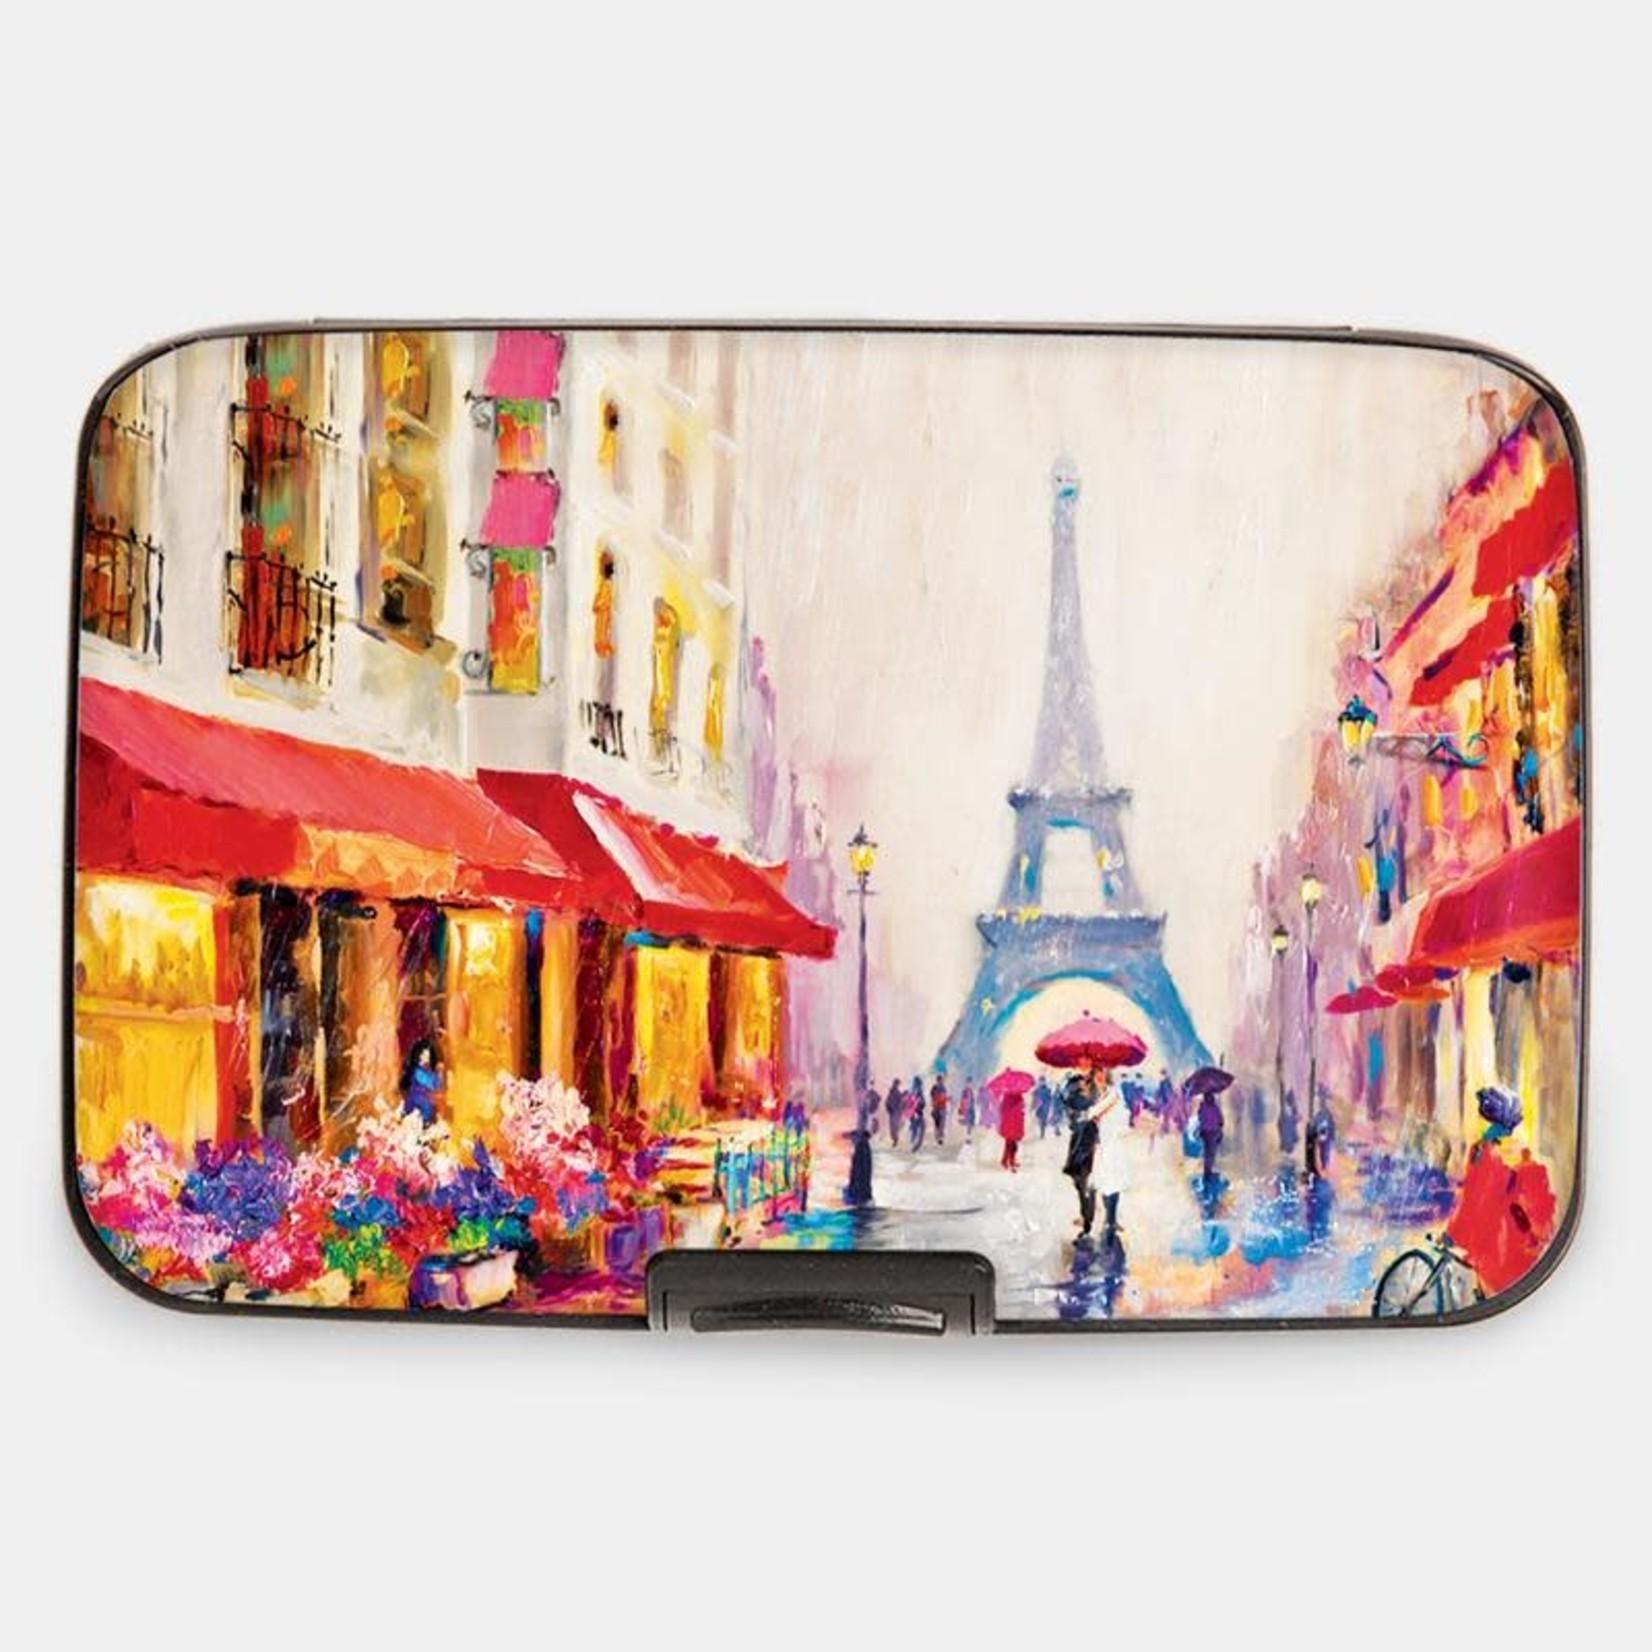 Monarque Armored Wallet - Travel Paris